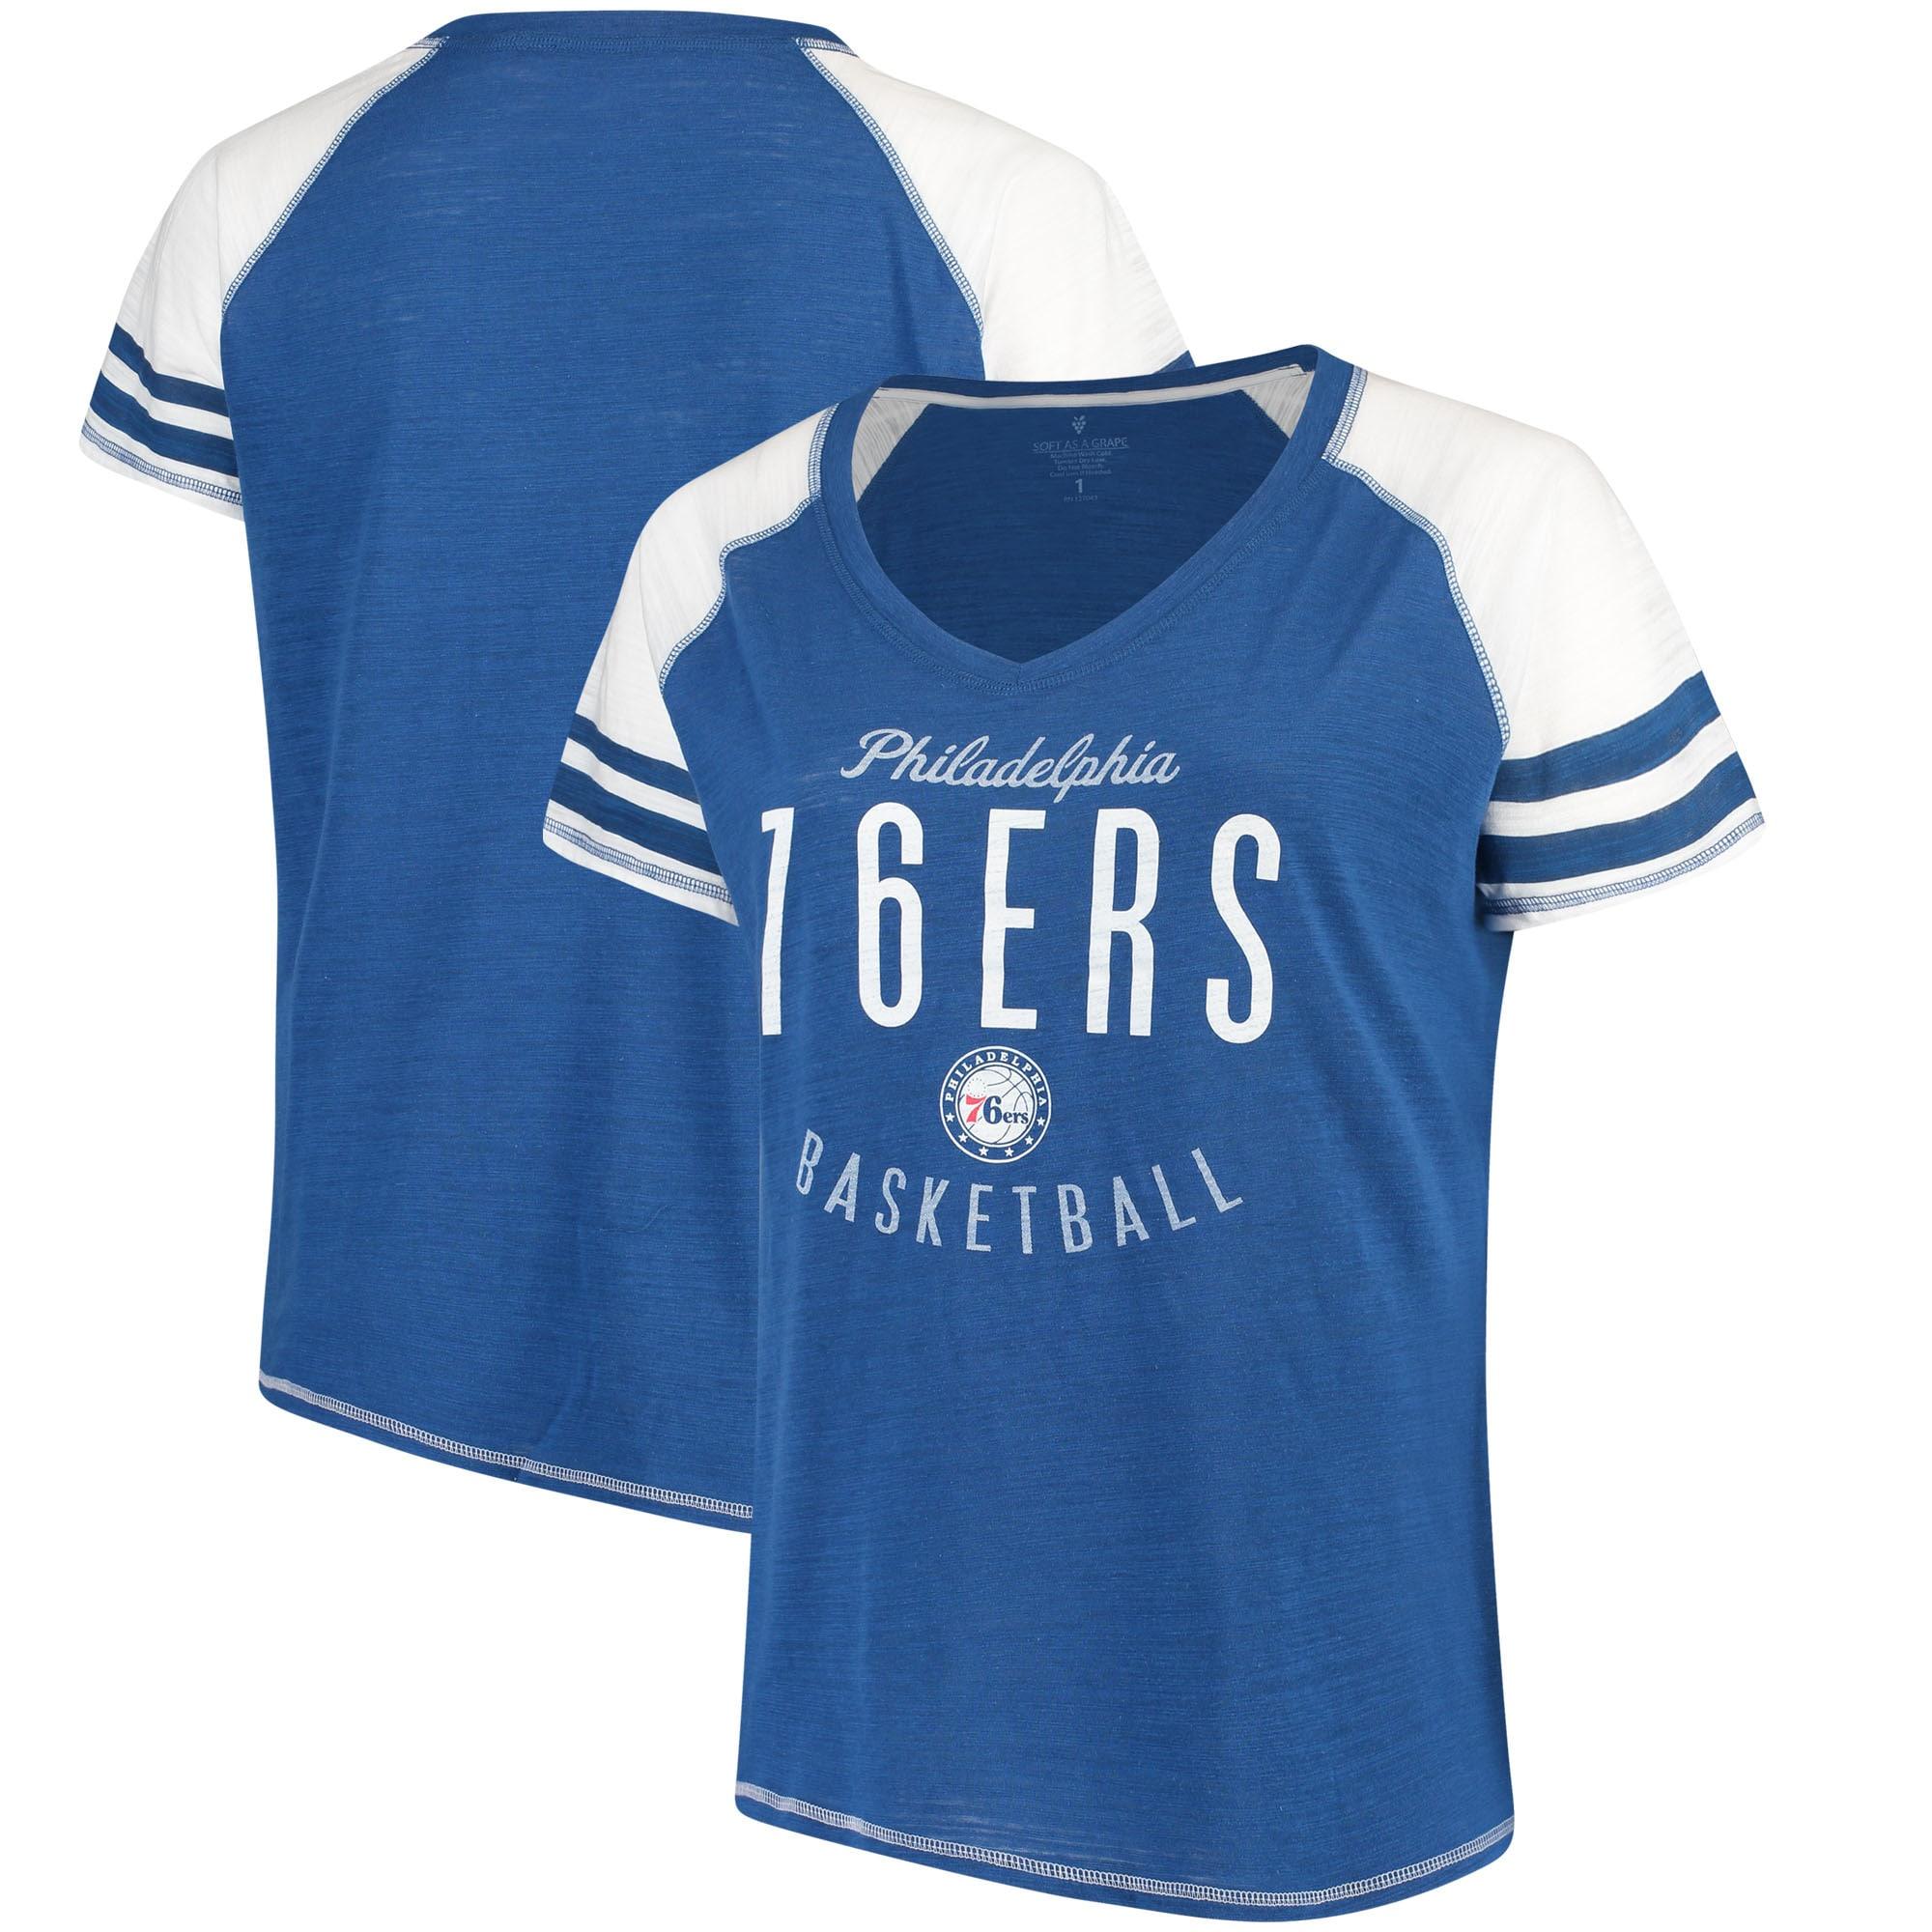 Philadelphia 76ers Soft as a Grape Women's Plus Size Color Blocked Raglan Tri-Blend V-Neck T-Shirt - Royal